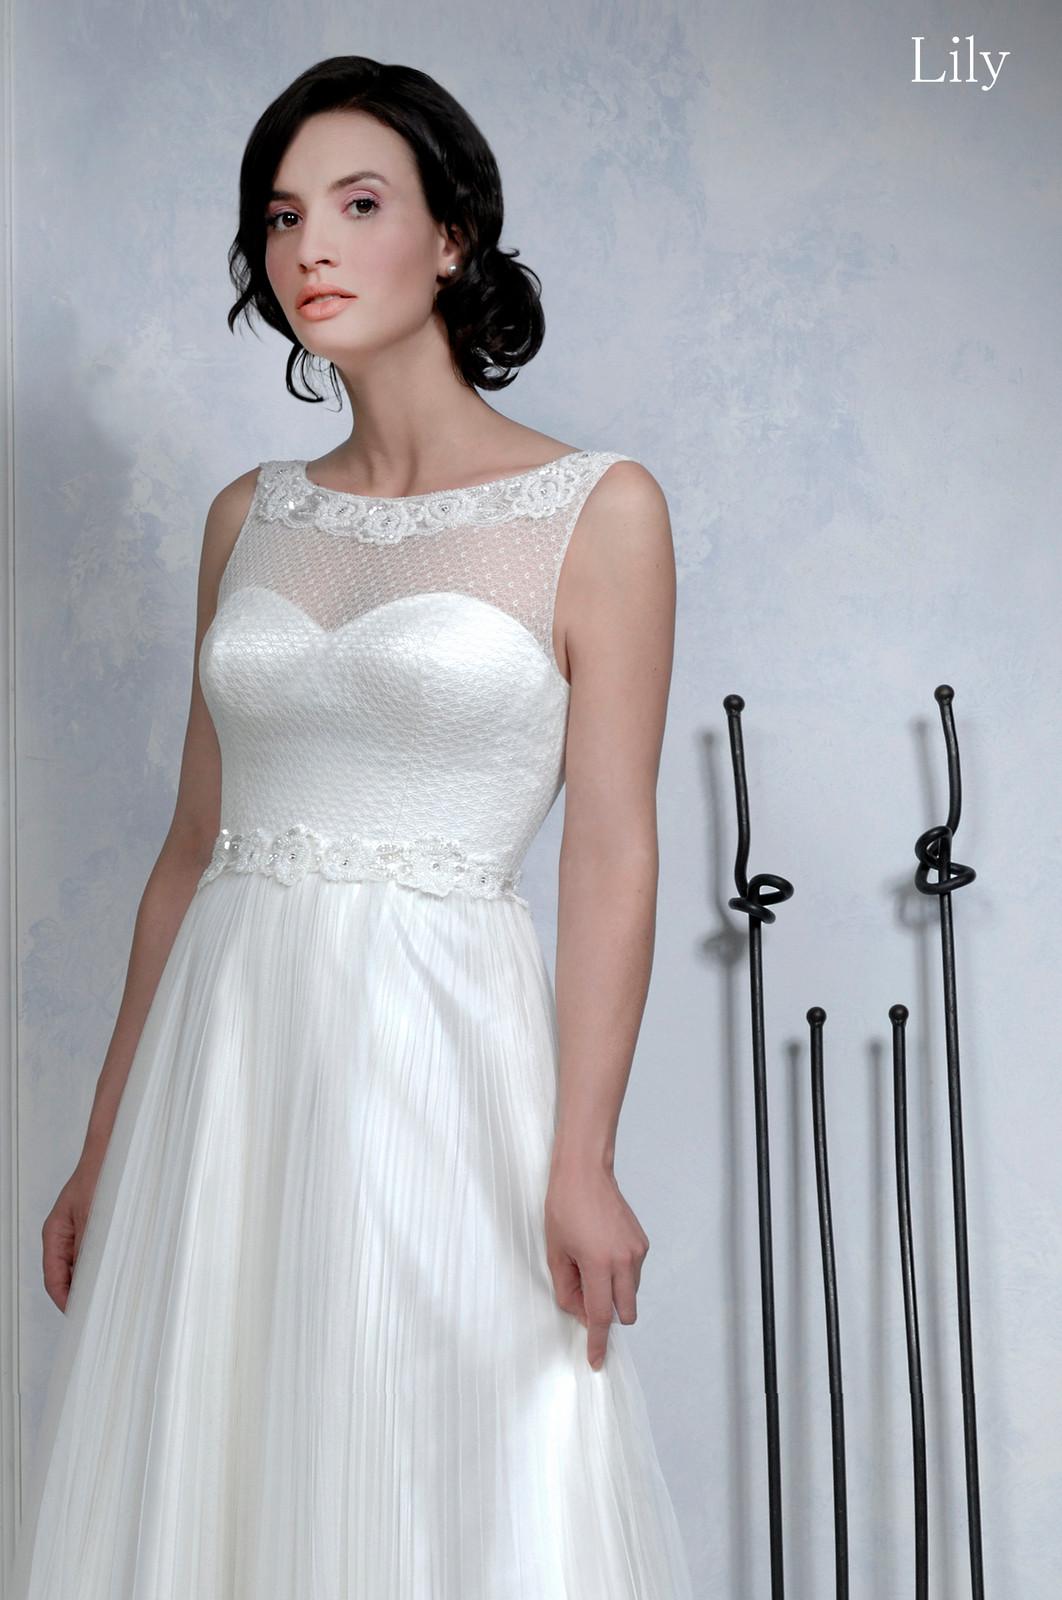 Dorable Rose Wedding Dresses Mold - All Wedding Dresses ...